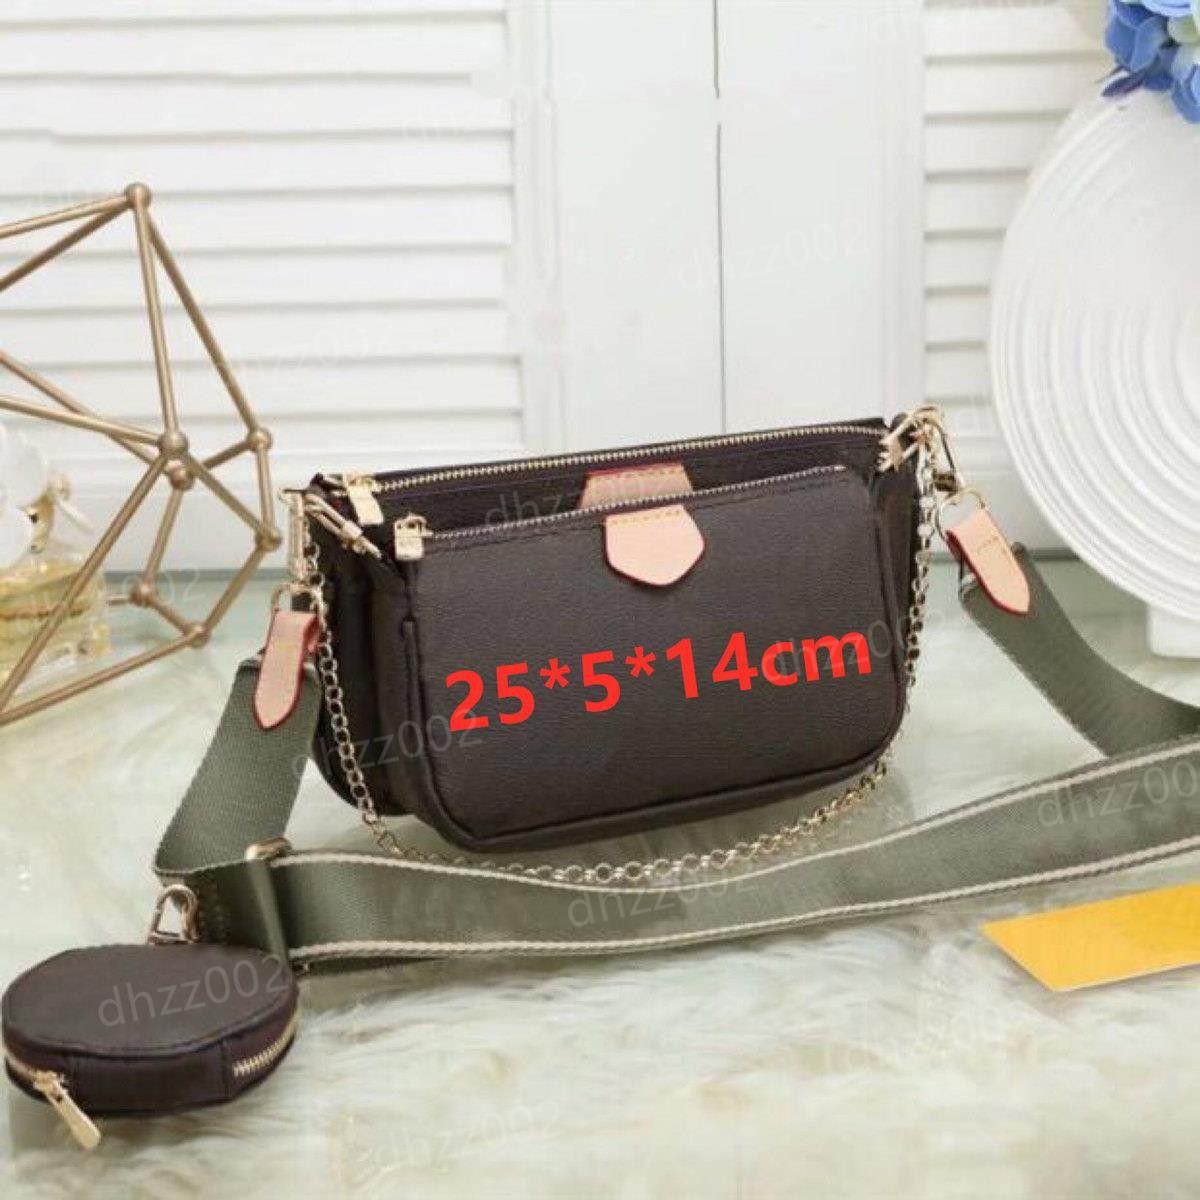 bags  Bolsa Mulheres Bolsas Multi PoChette Bag Cadeia Crossbody Bag Moda Pequena Ombro Bag 3 PCS Bolsa Multi Cor Coreiras WFDGF